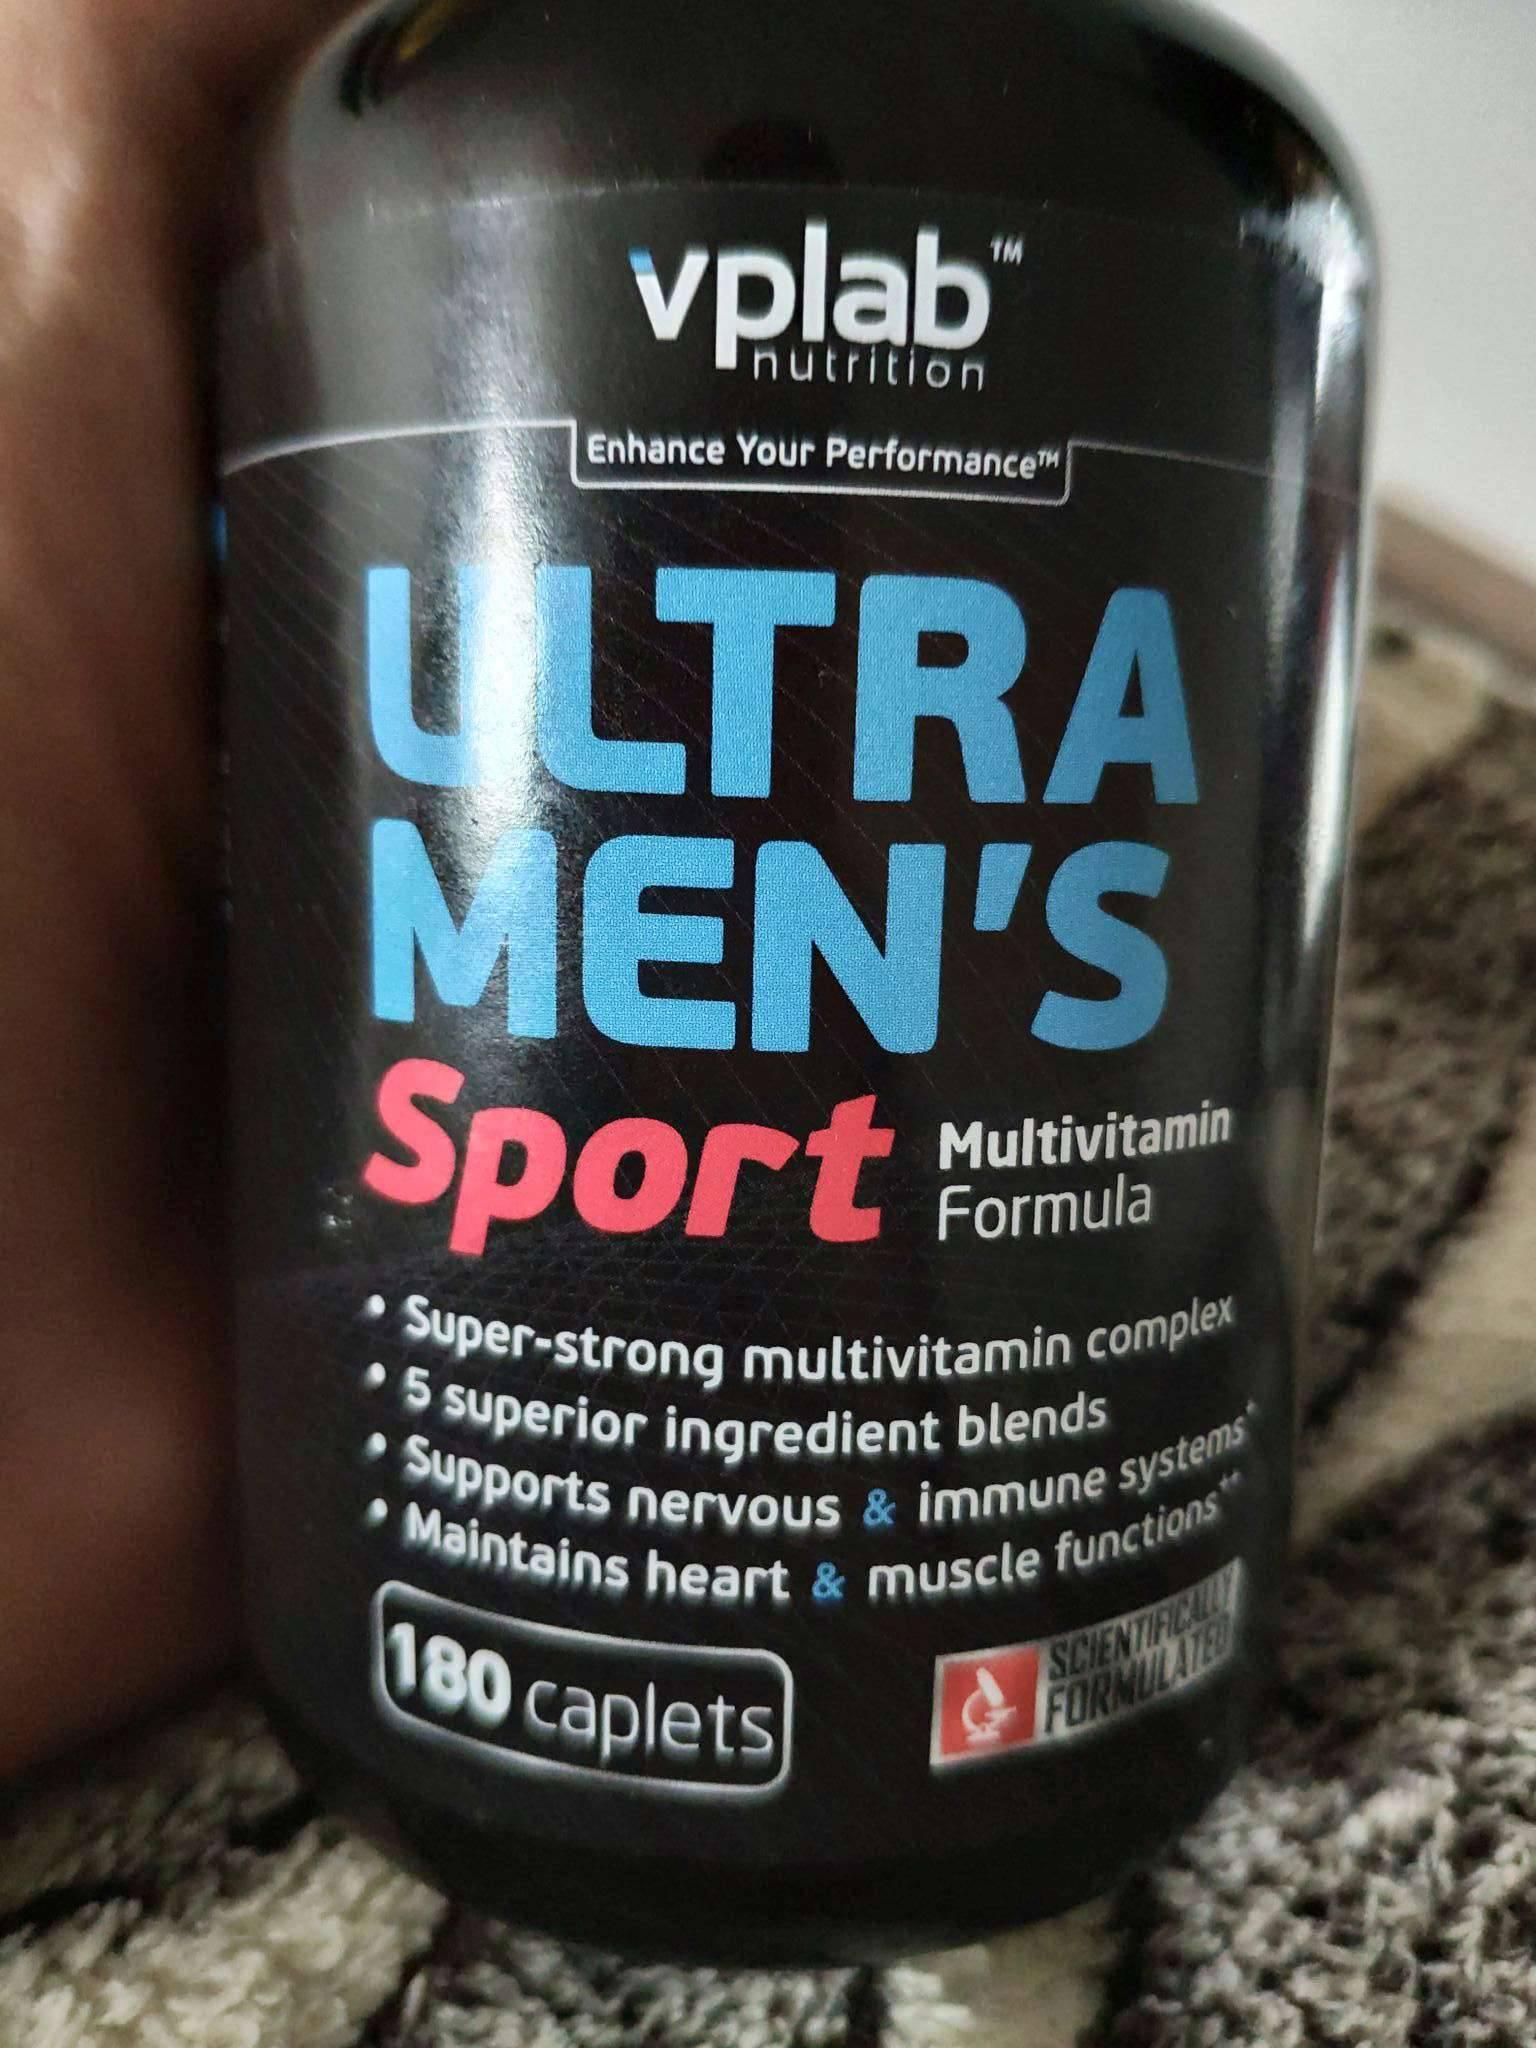 Ultra men's sport multivitamin formula от vp laboratory: как принимать витамины для мужчин - спортзал